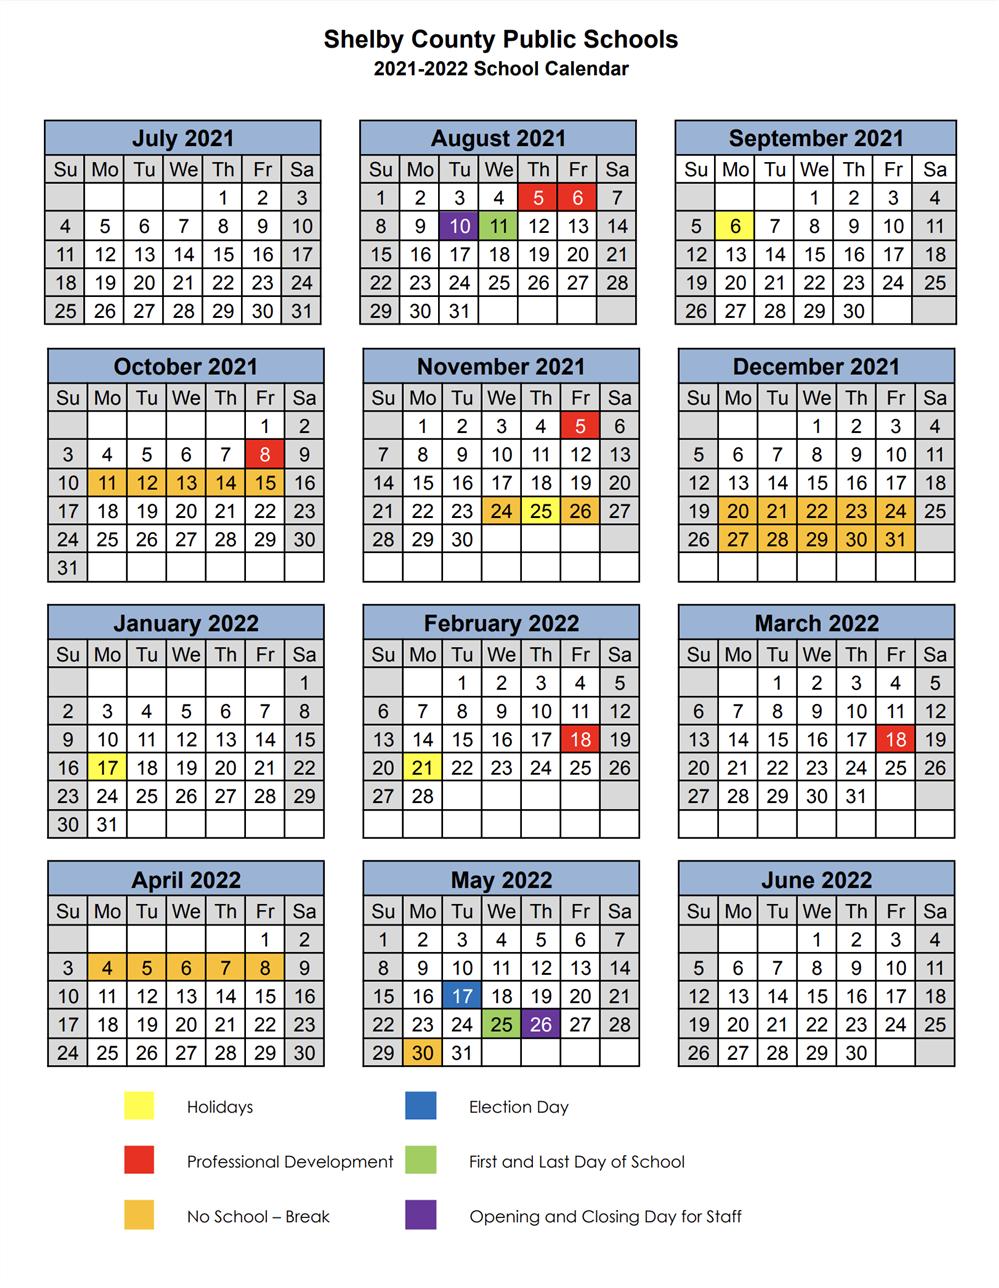 Scps Calendar 2022.Shelby County Public Schools Calendar